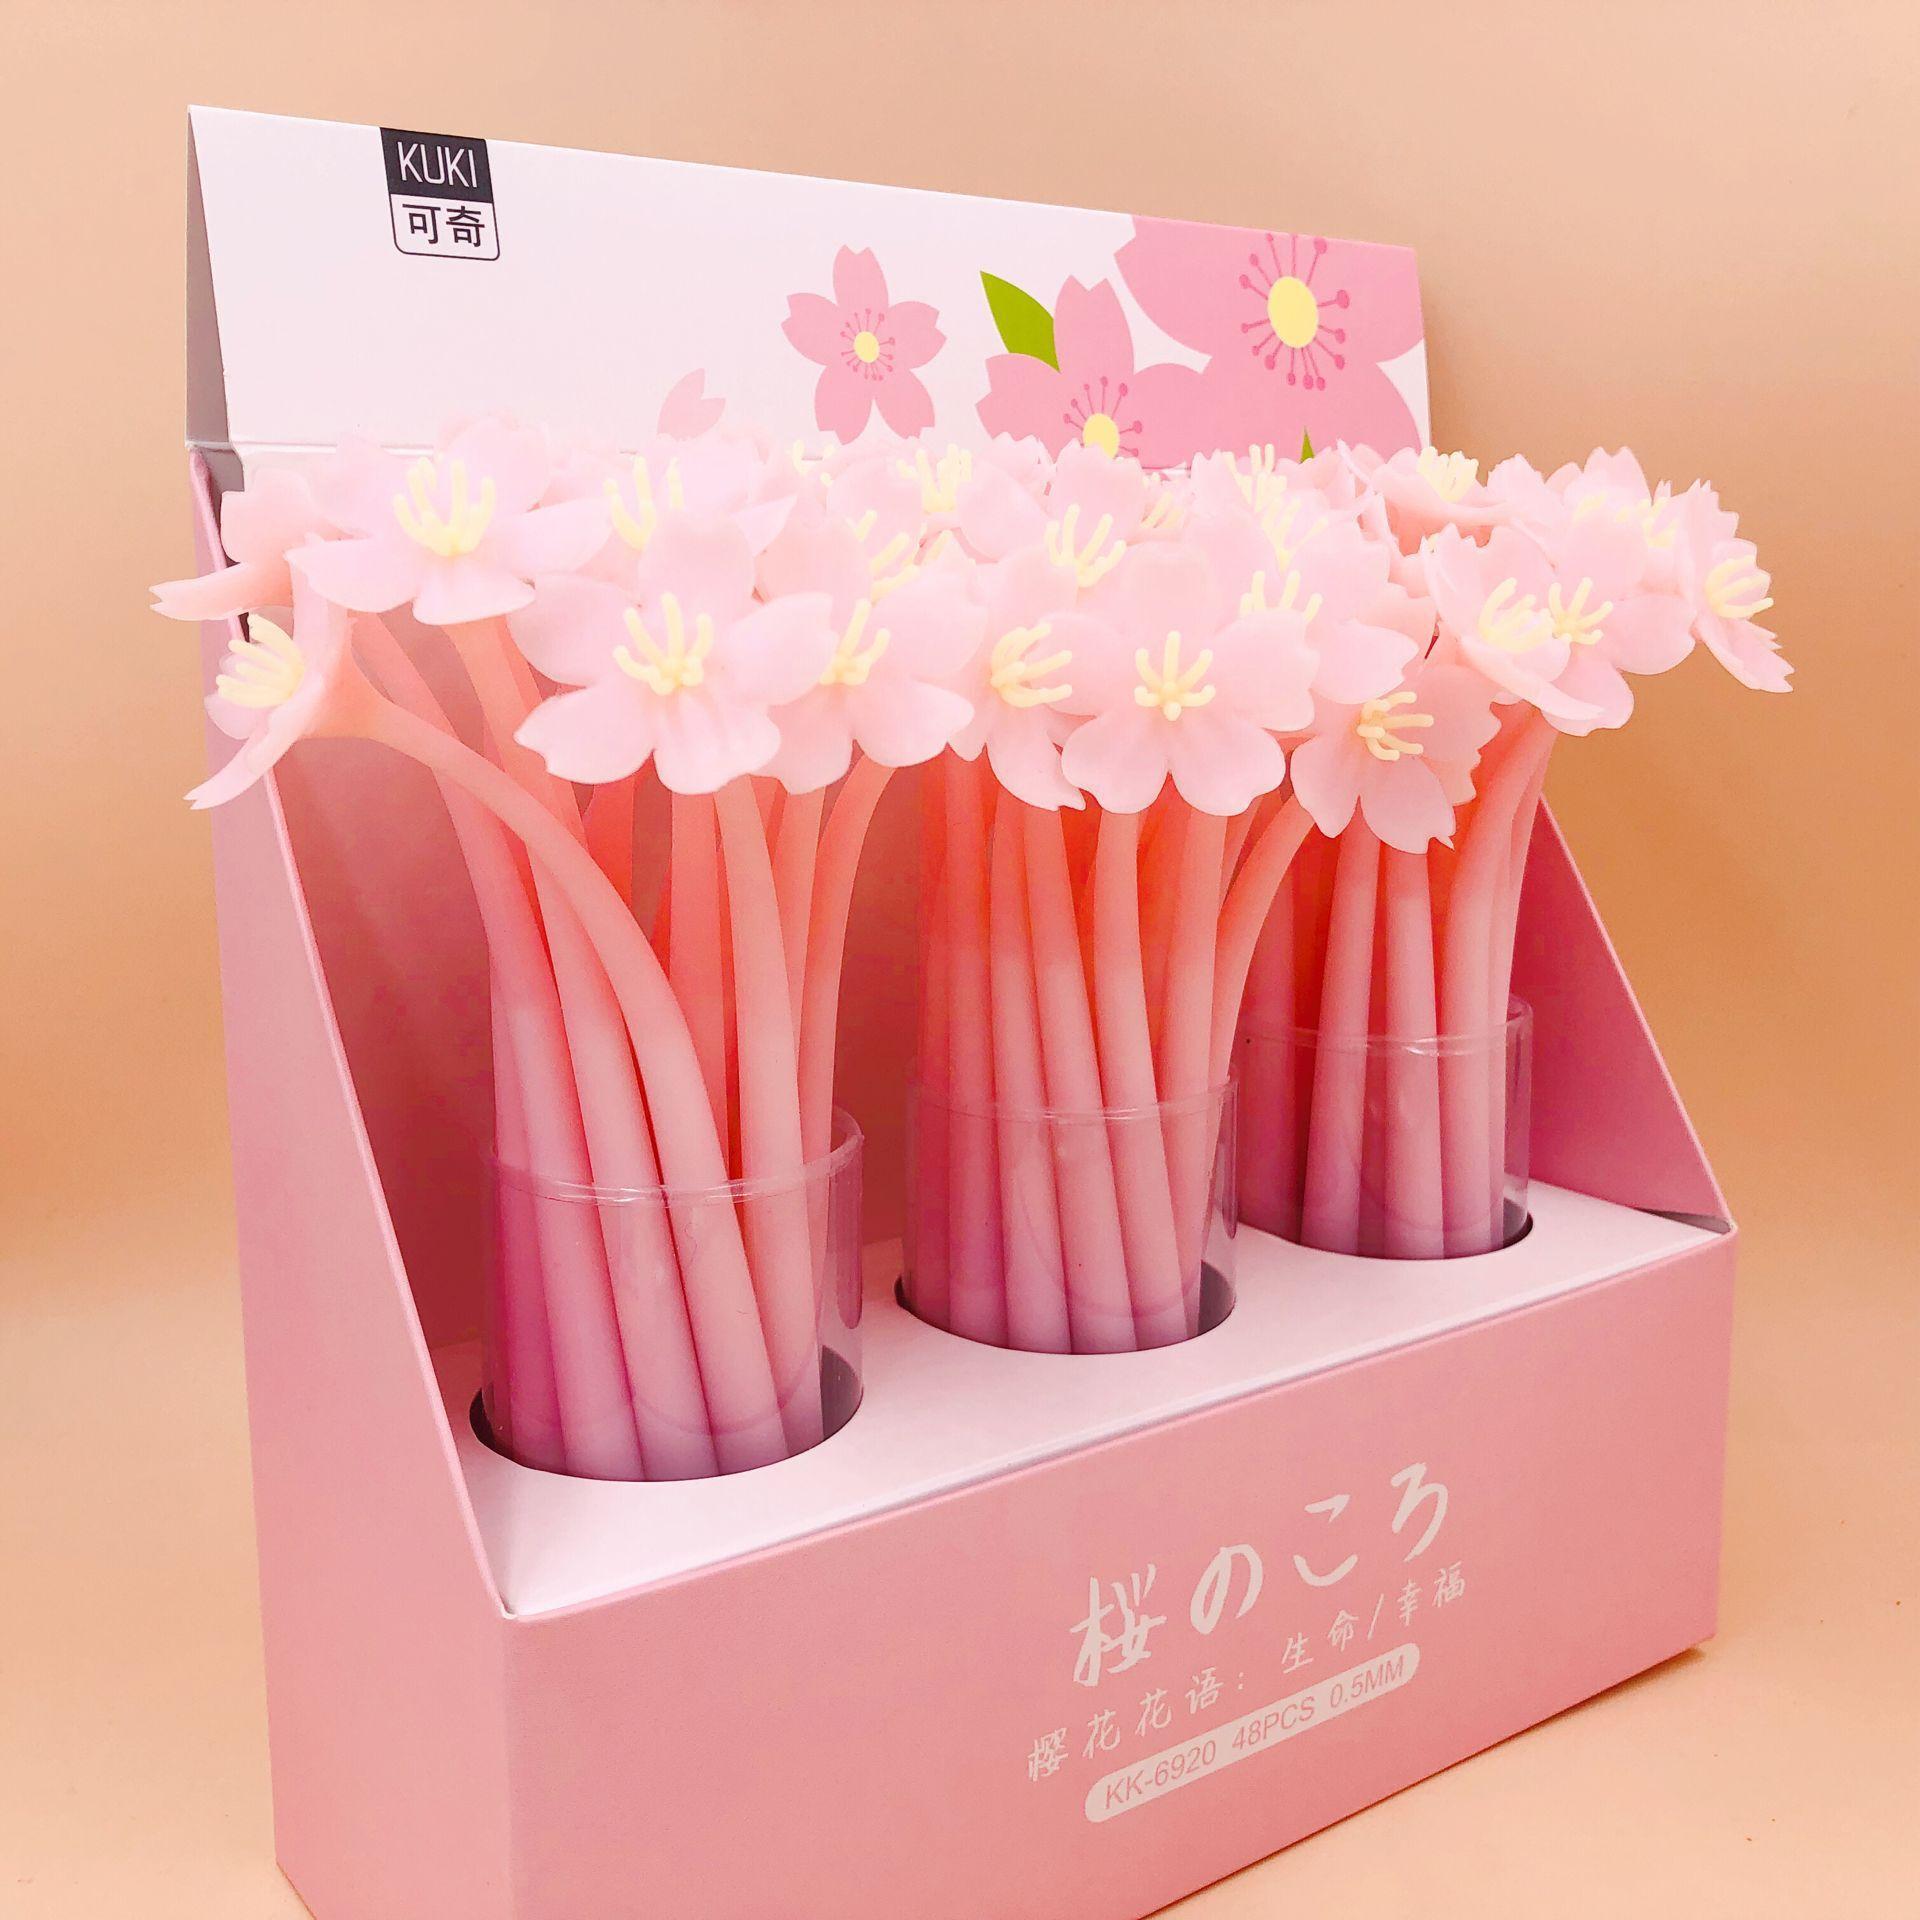 1Pcs Kawaii Sakura Creative Japanese Flower Cherry Soft Silicone Korean Stationery Student Black Ink Signature Gel Pen